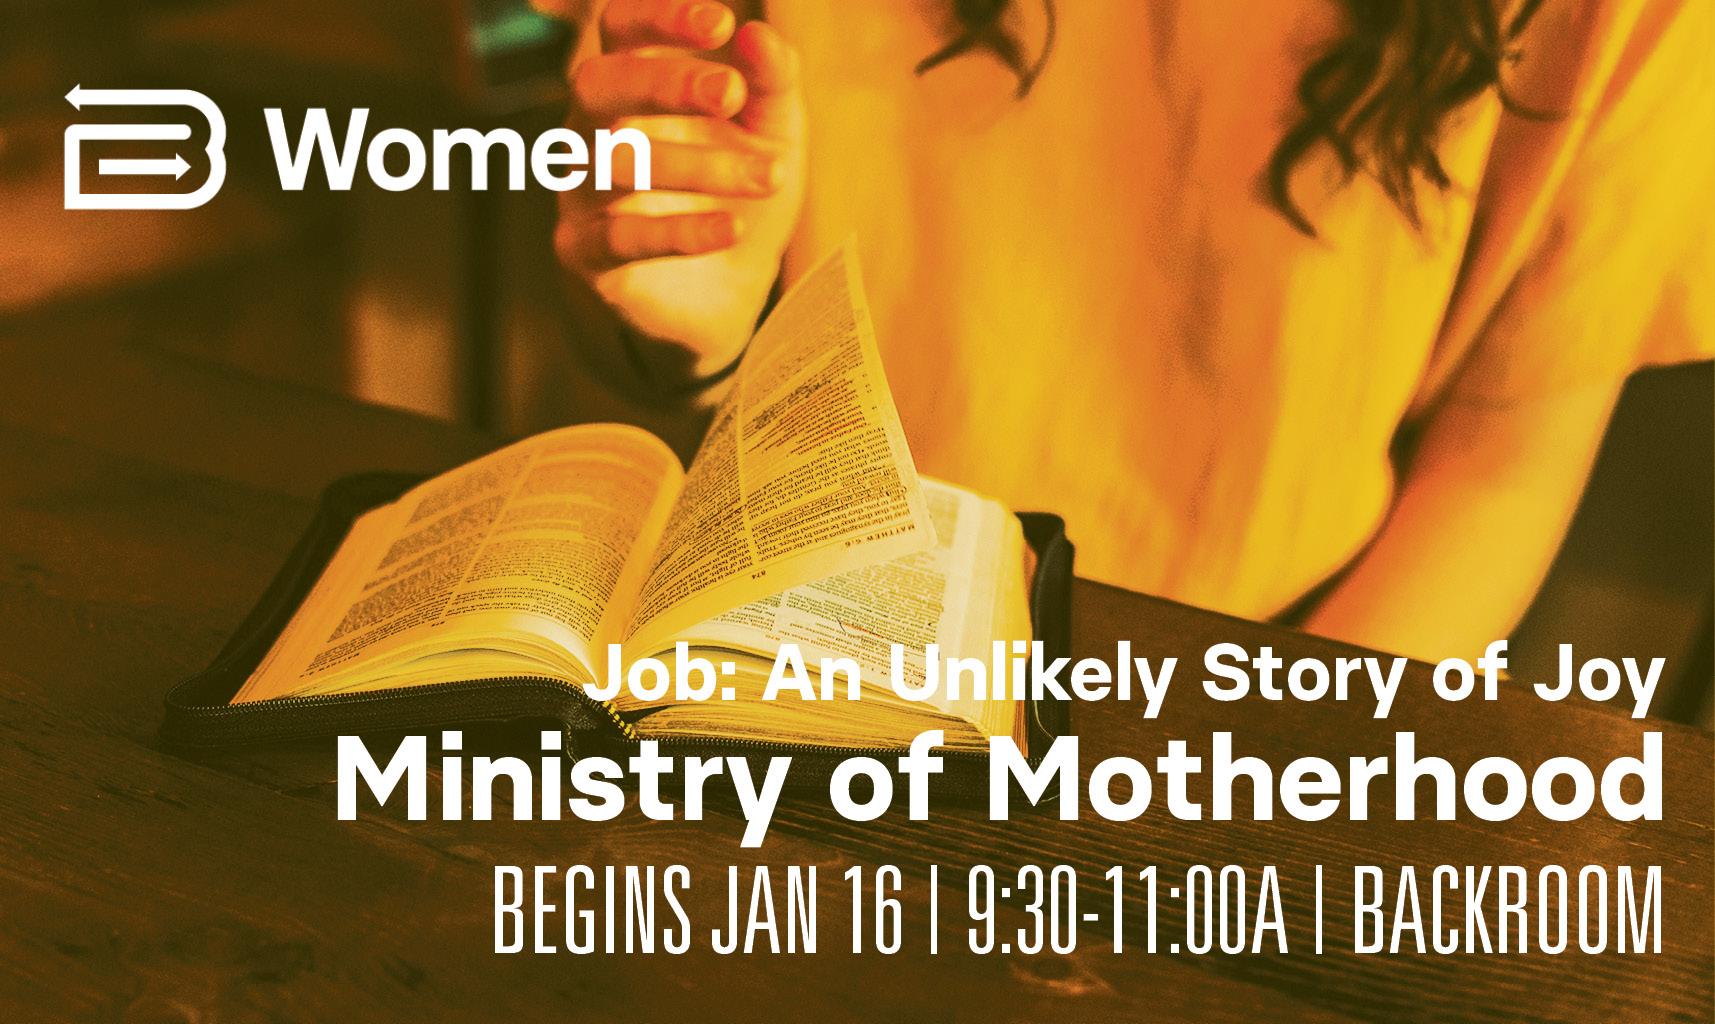 Ministry of Motherhood_Job image